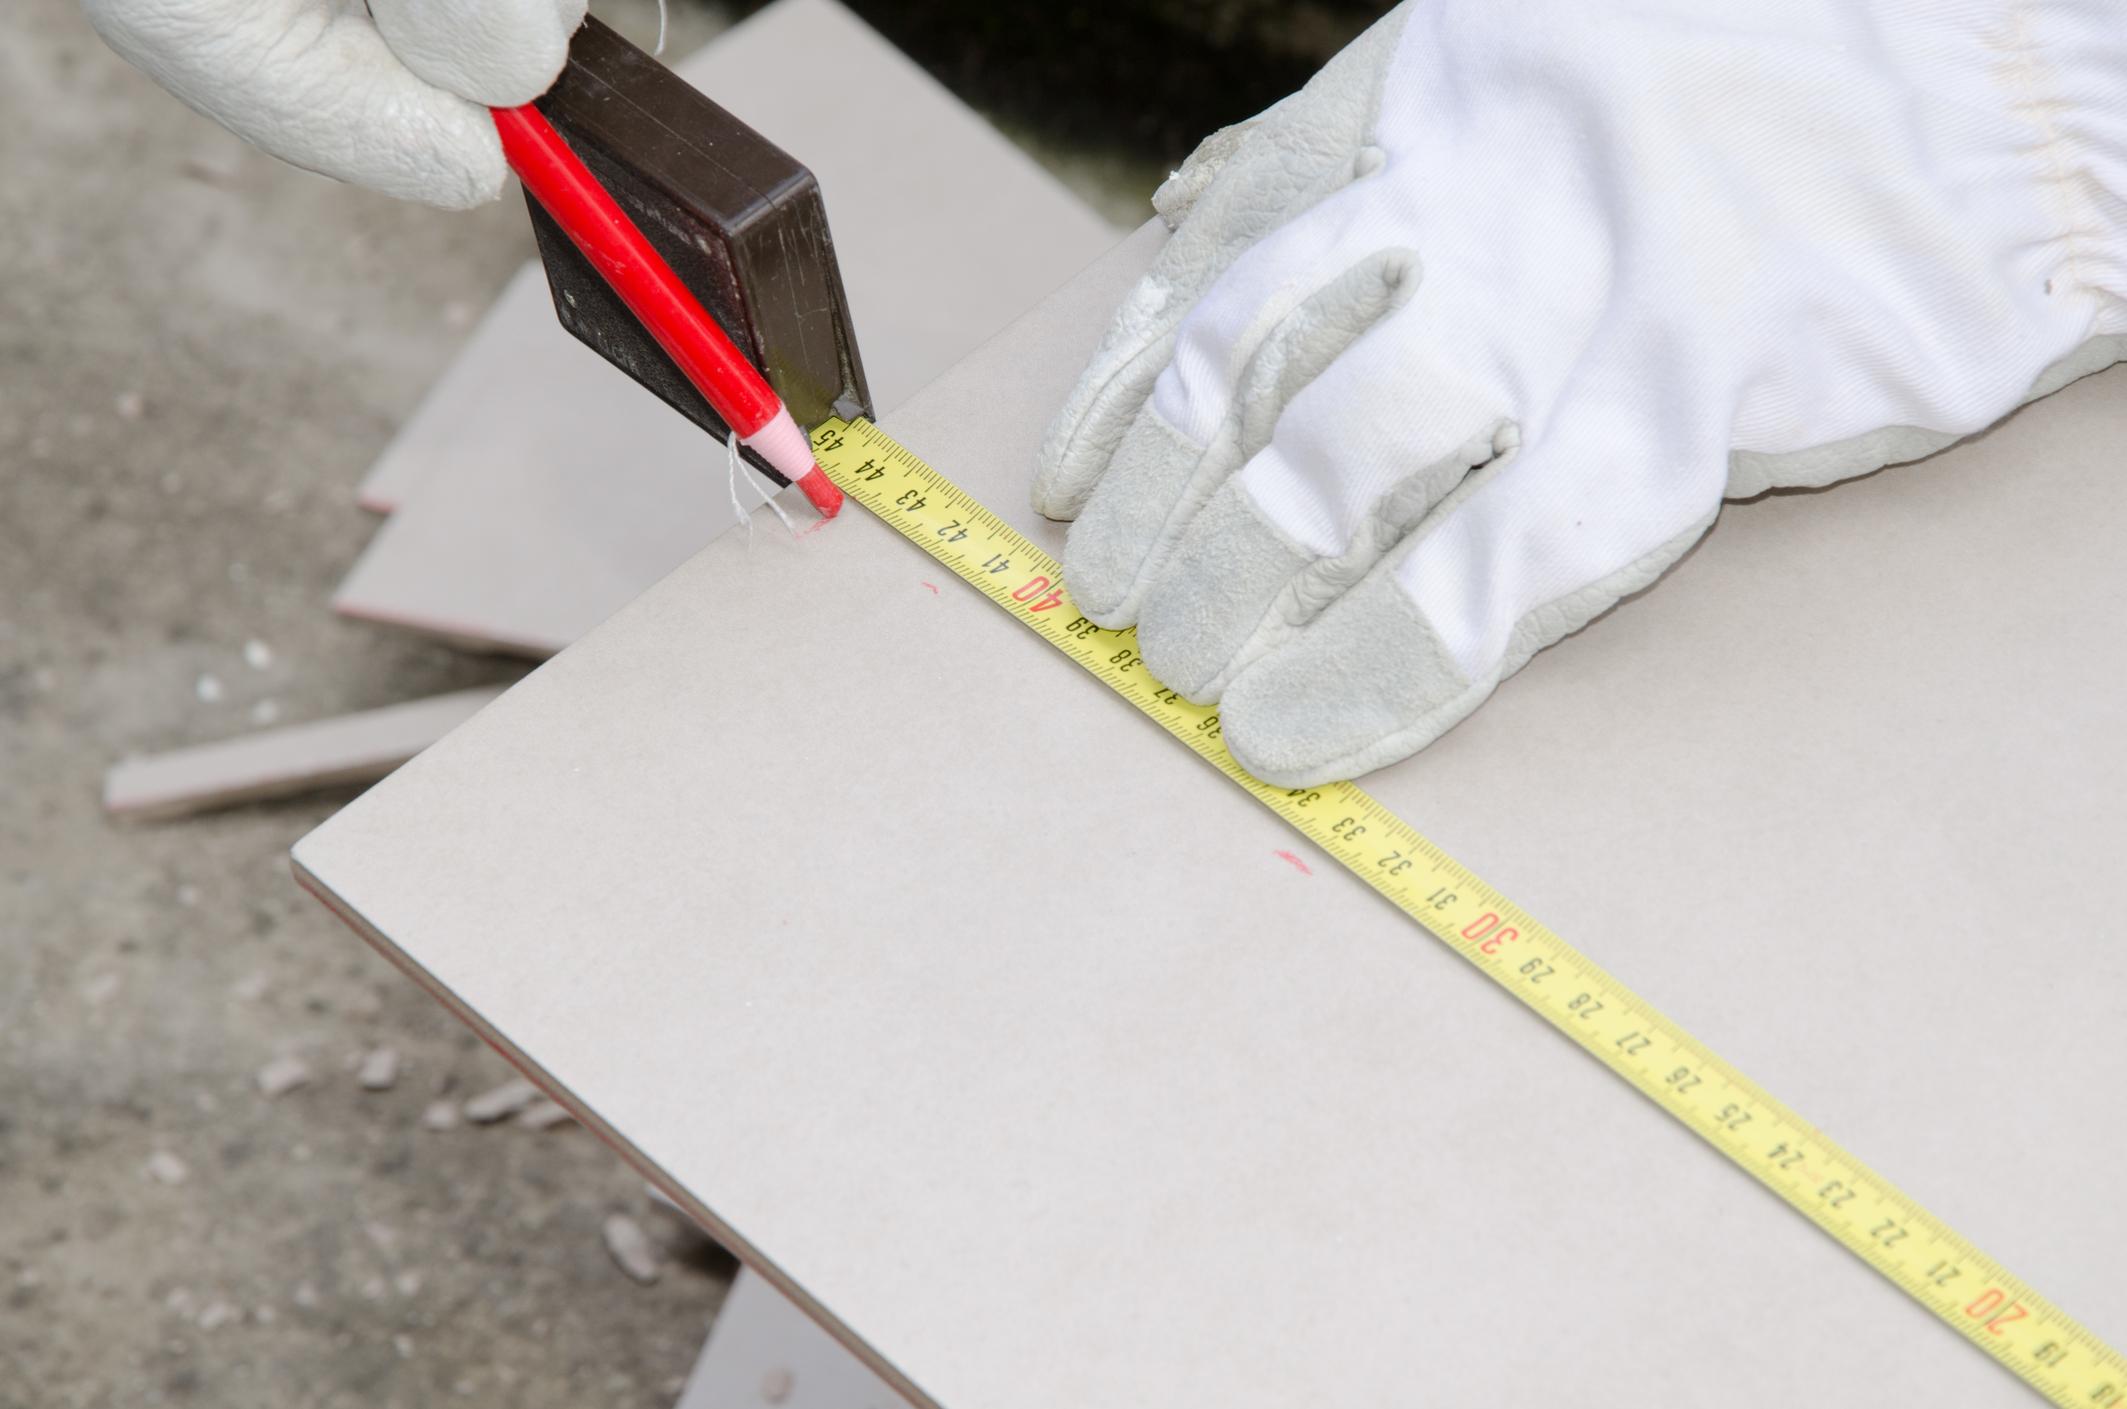 Tiler measuring tile before cutting